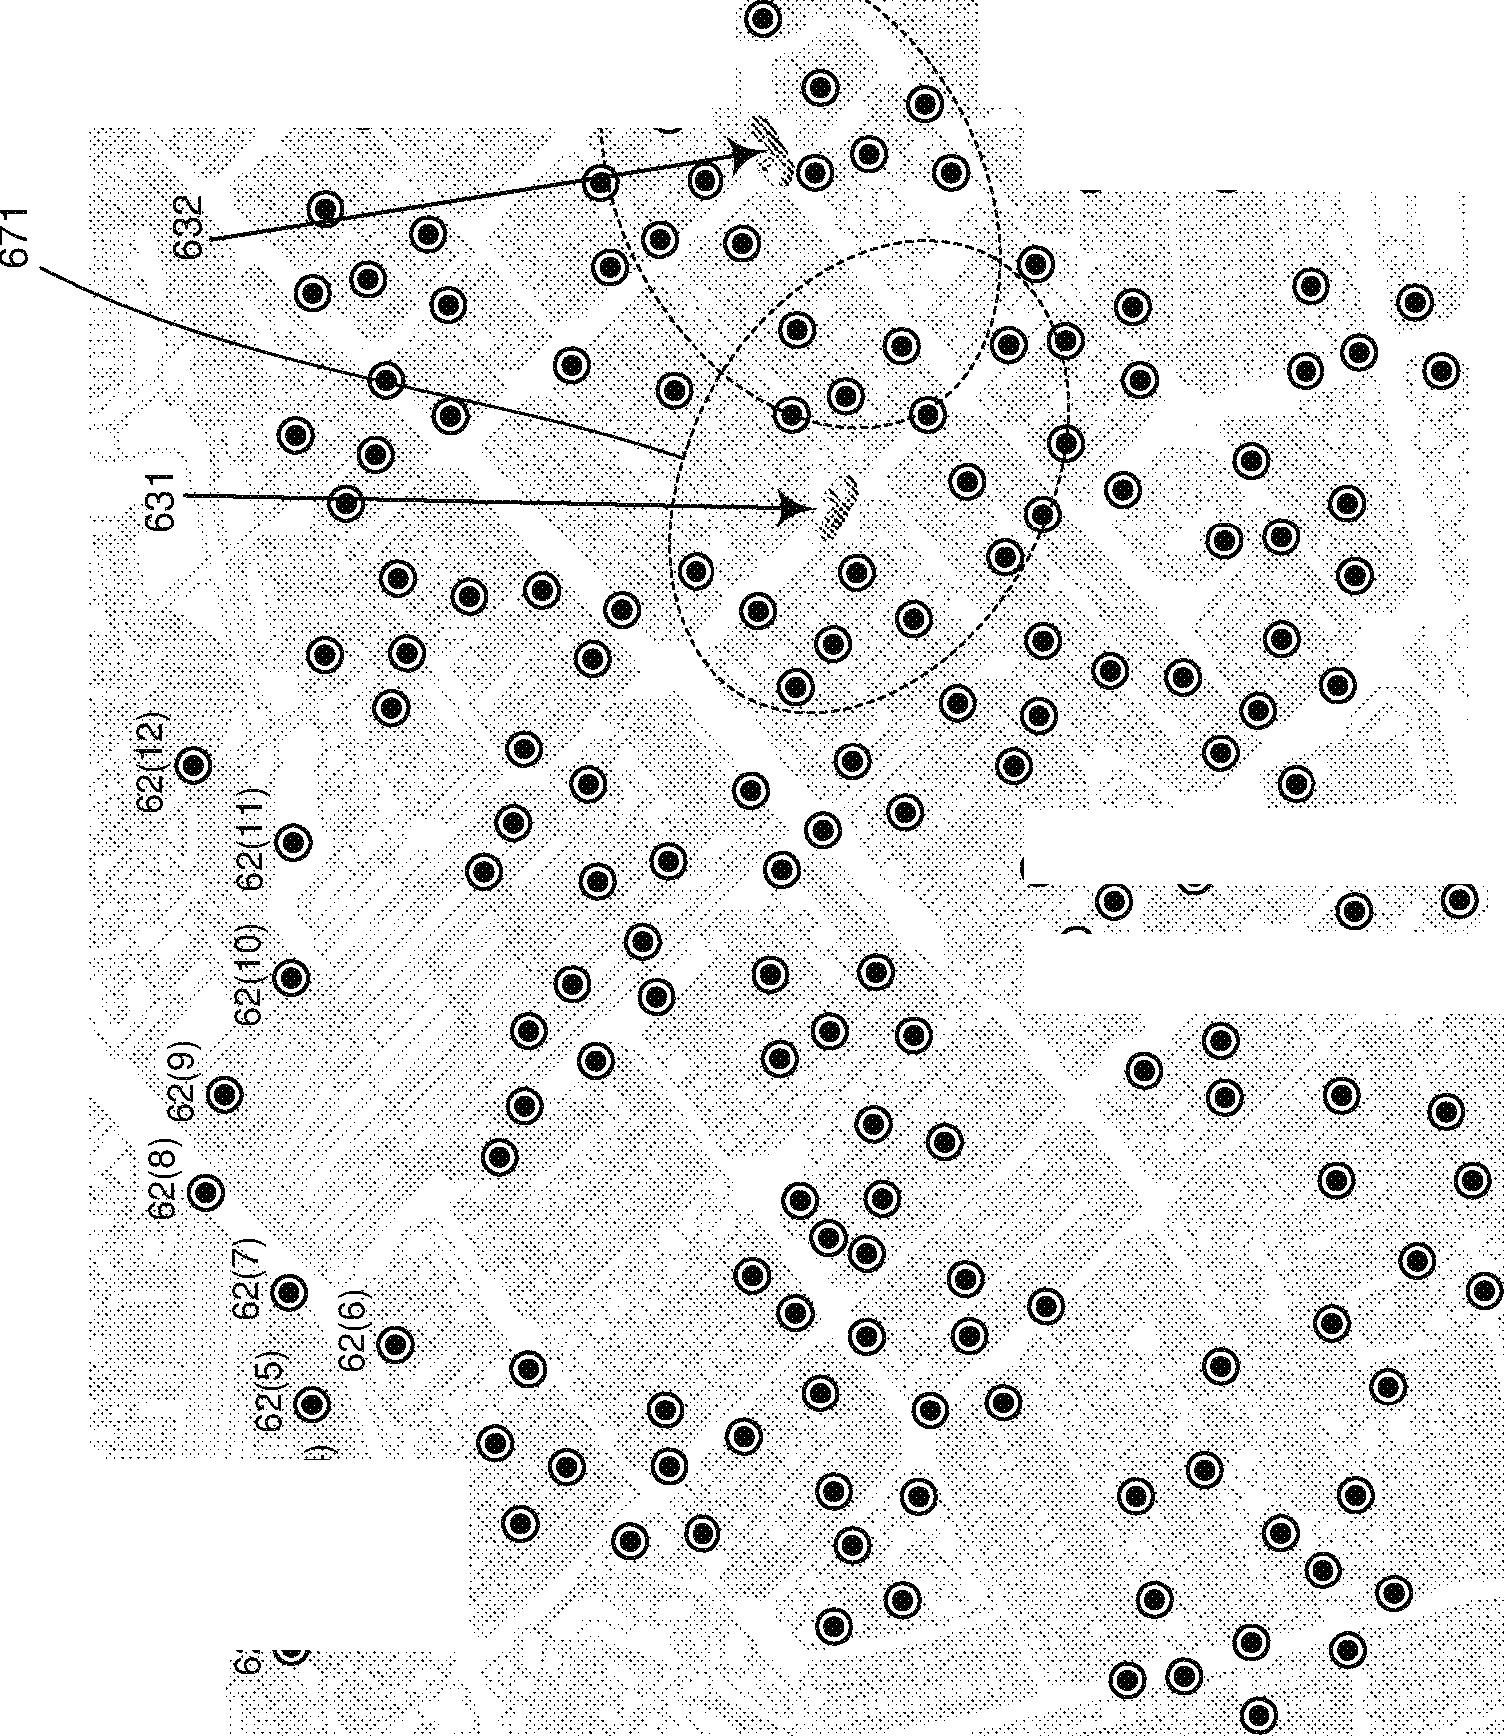 Figure GB2552241A_D0004